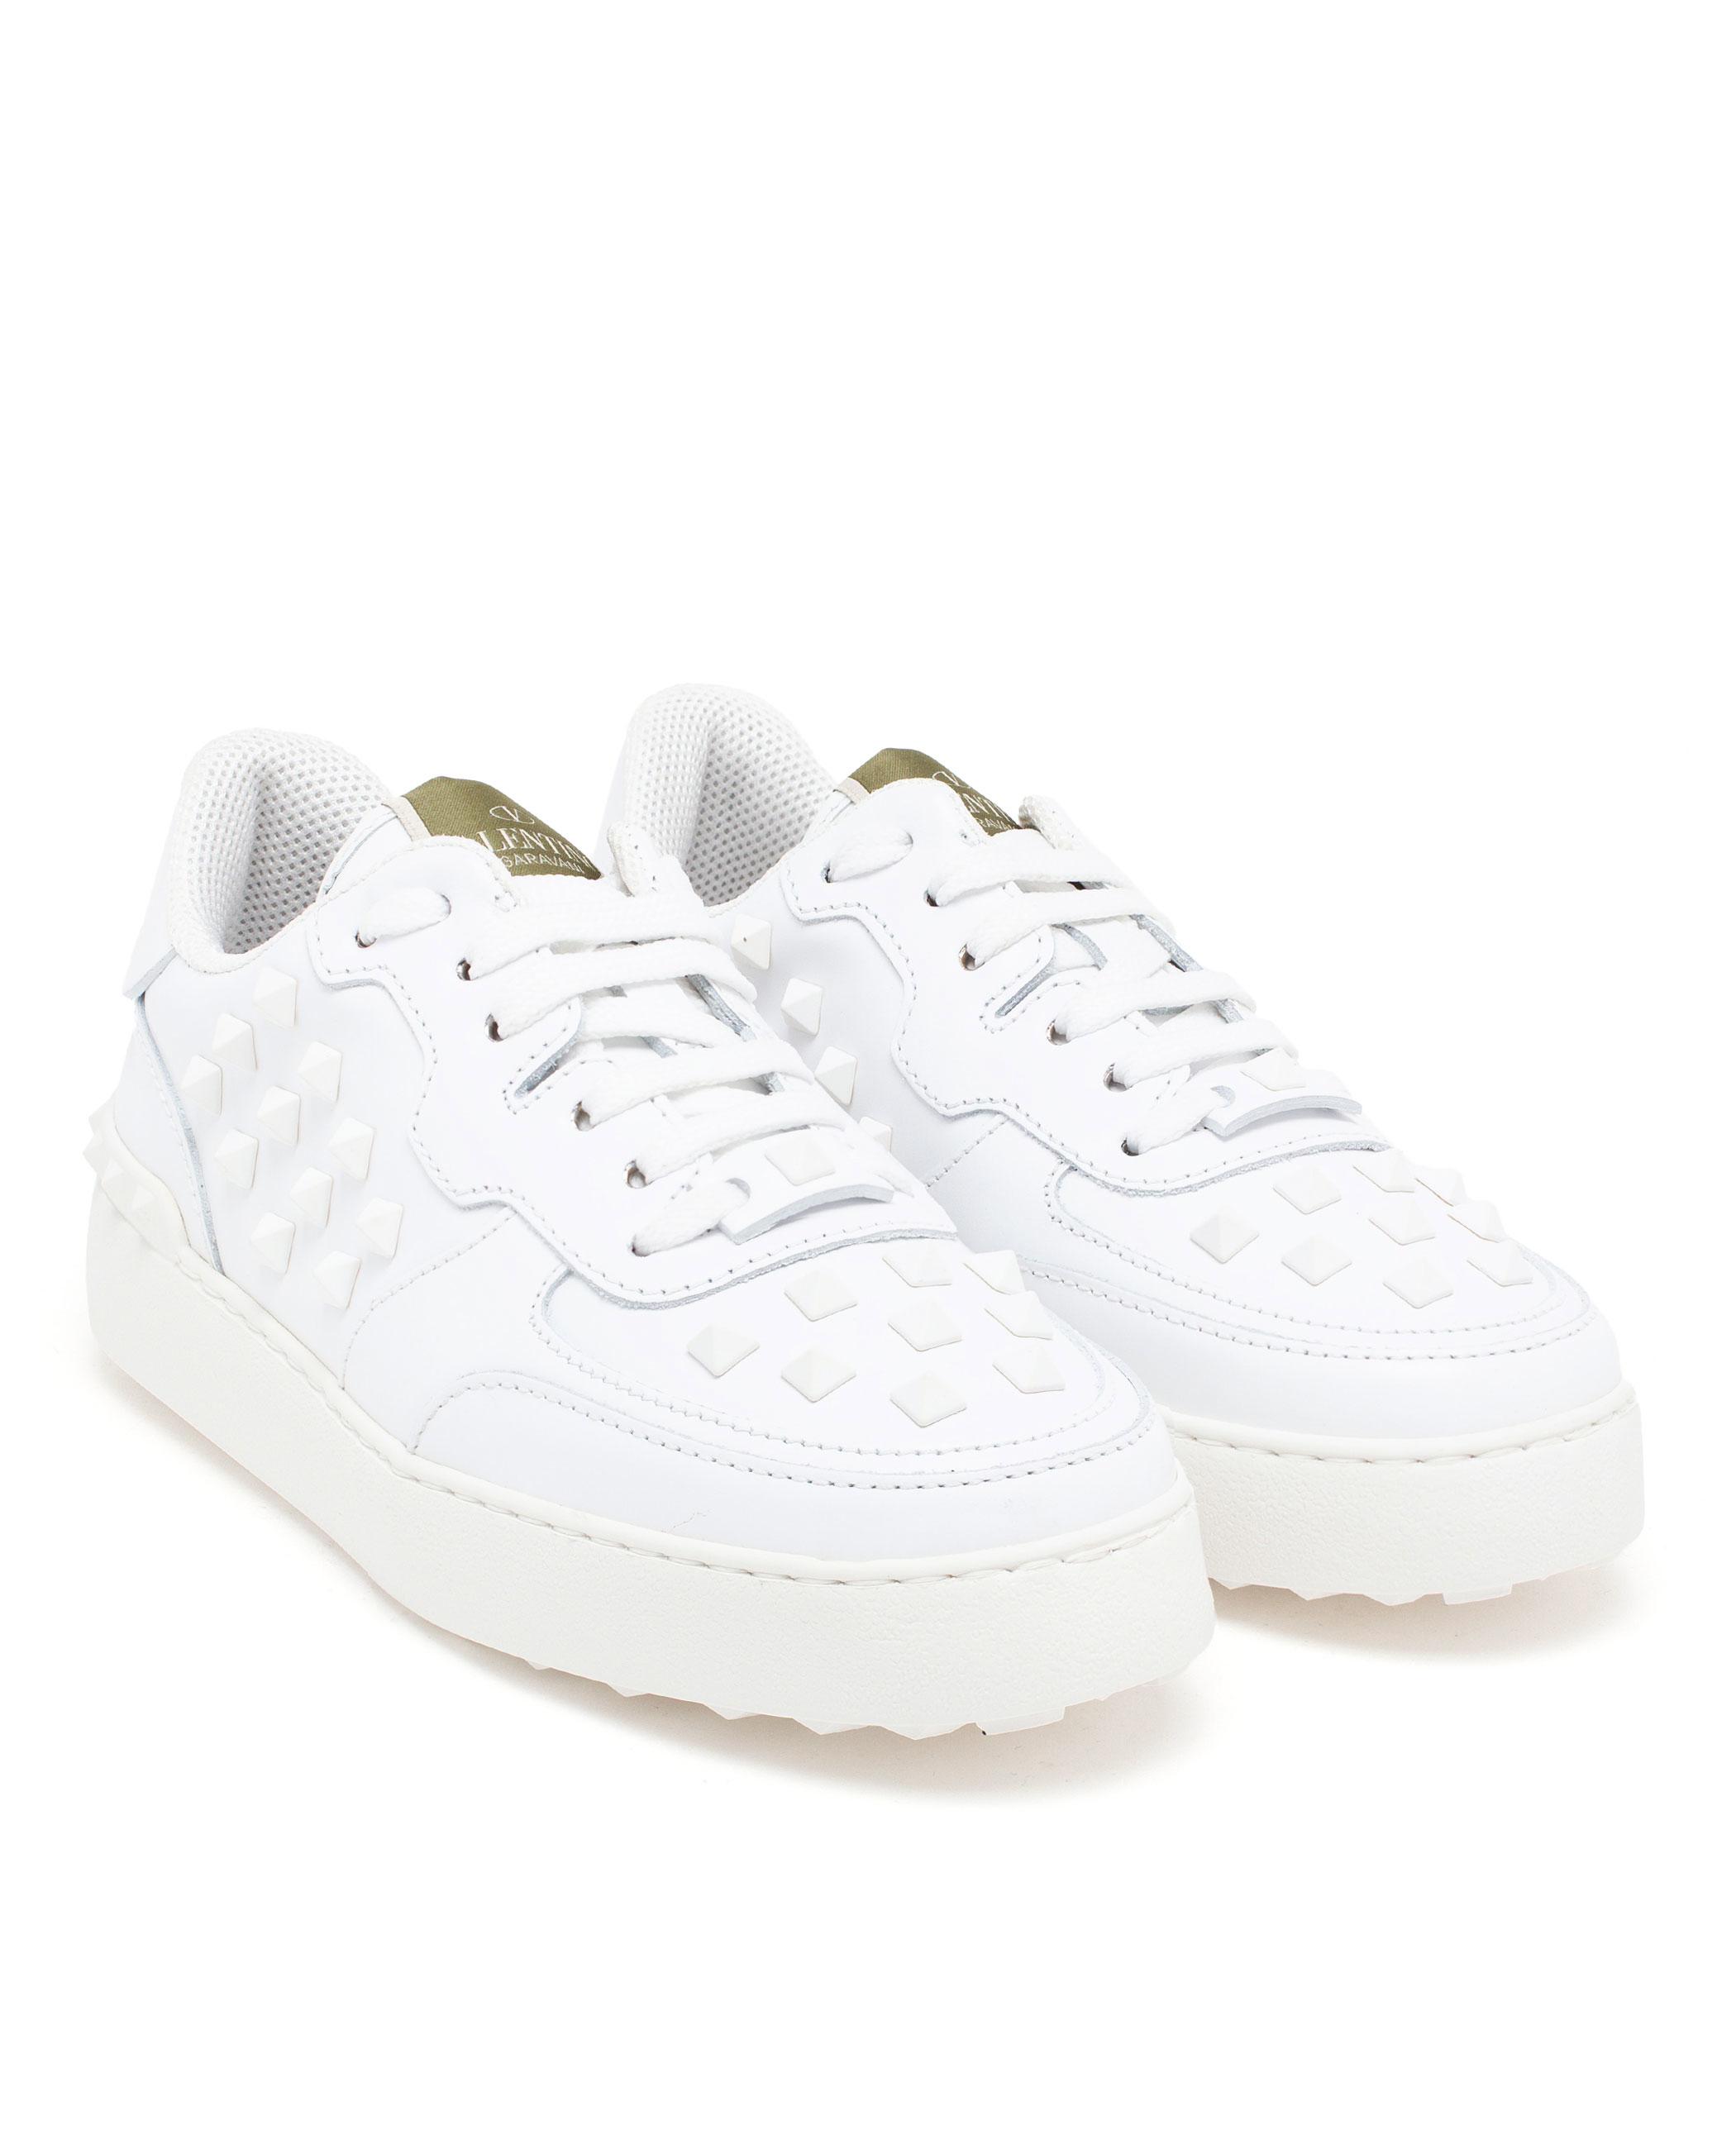 005f8de85ab7 Valentino Rockstud White Shoes